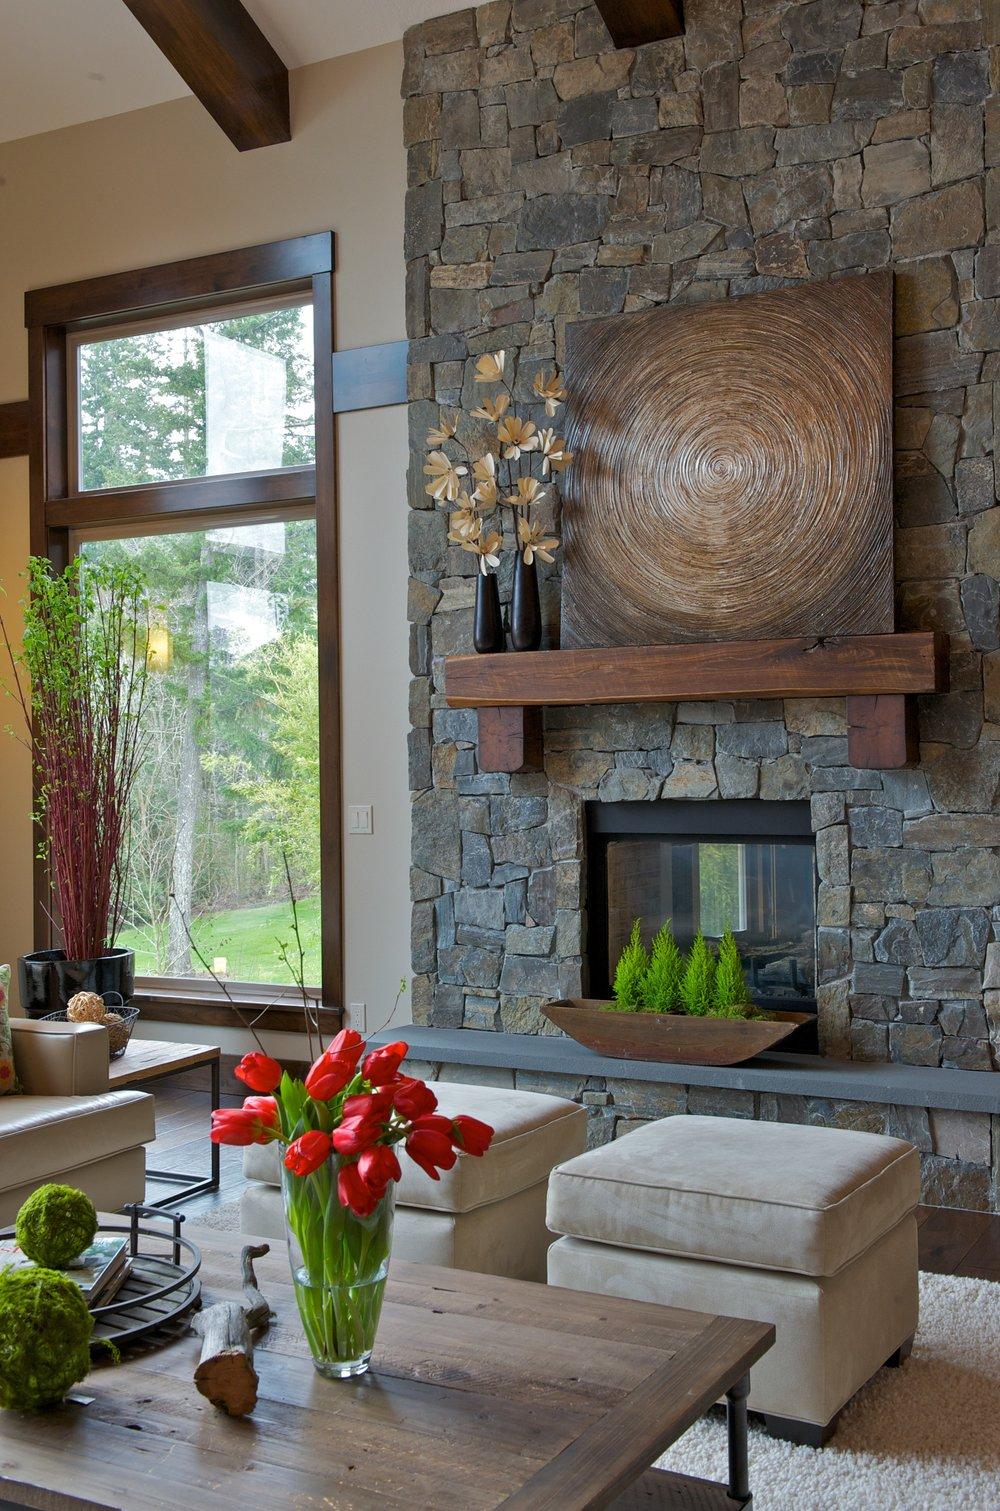 Thelin interiors 2011 (8).jpg